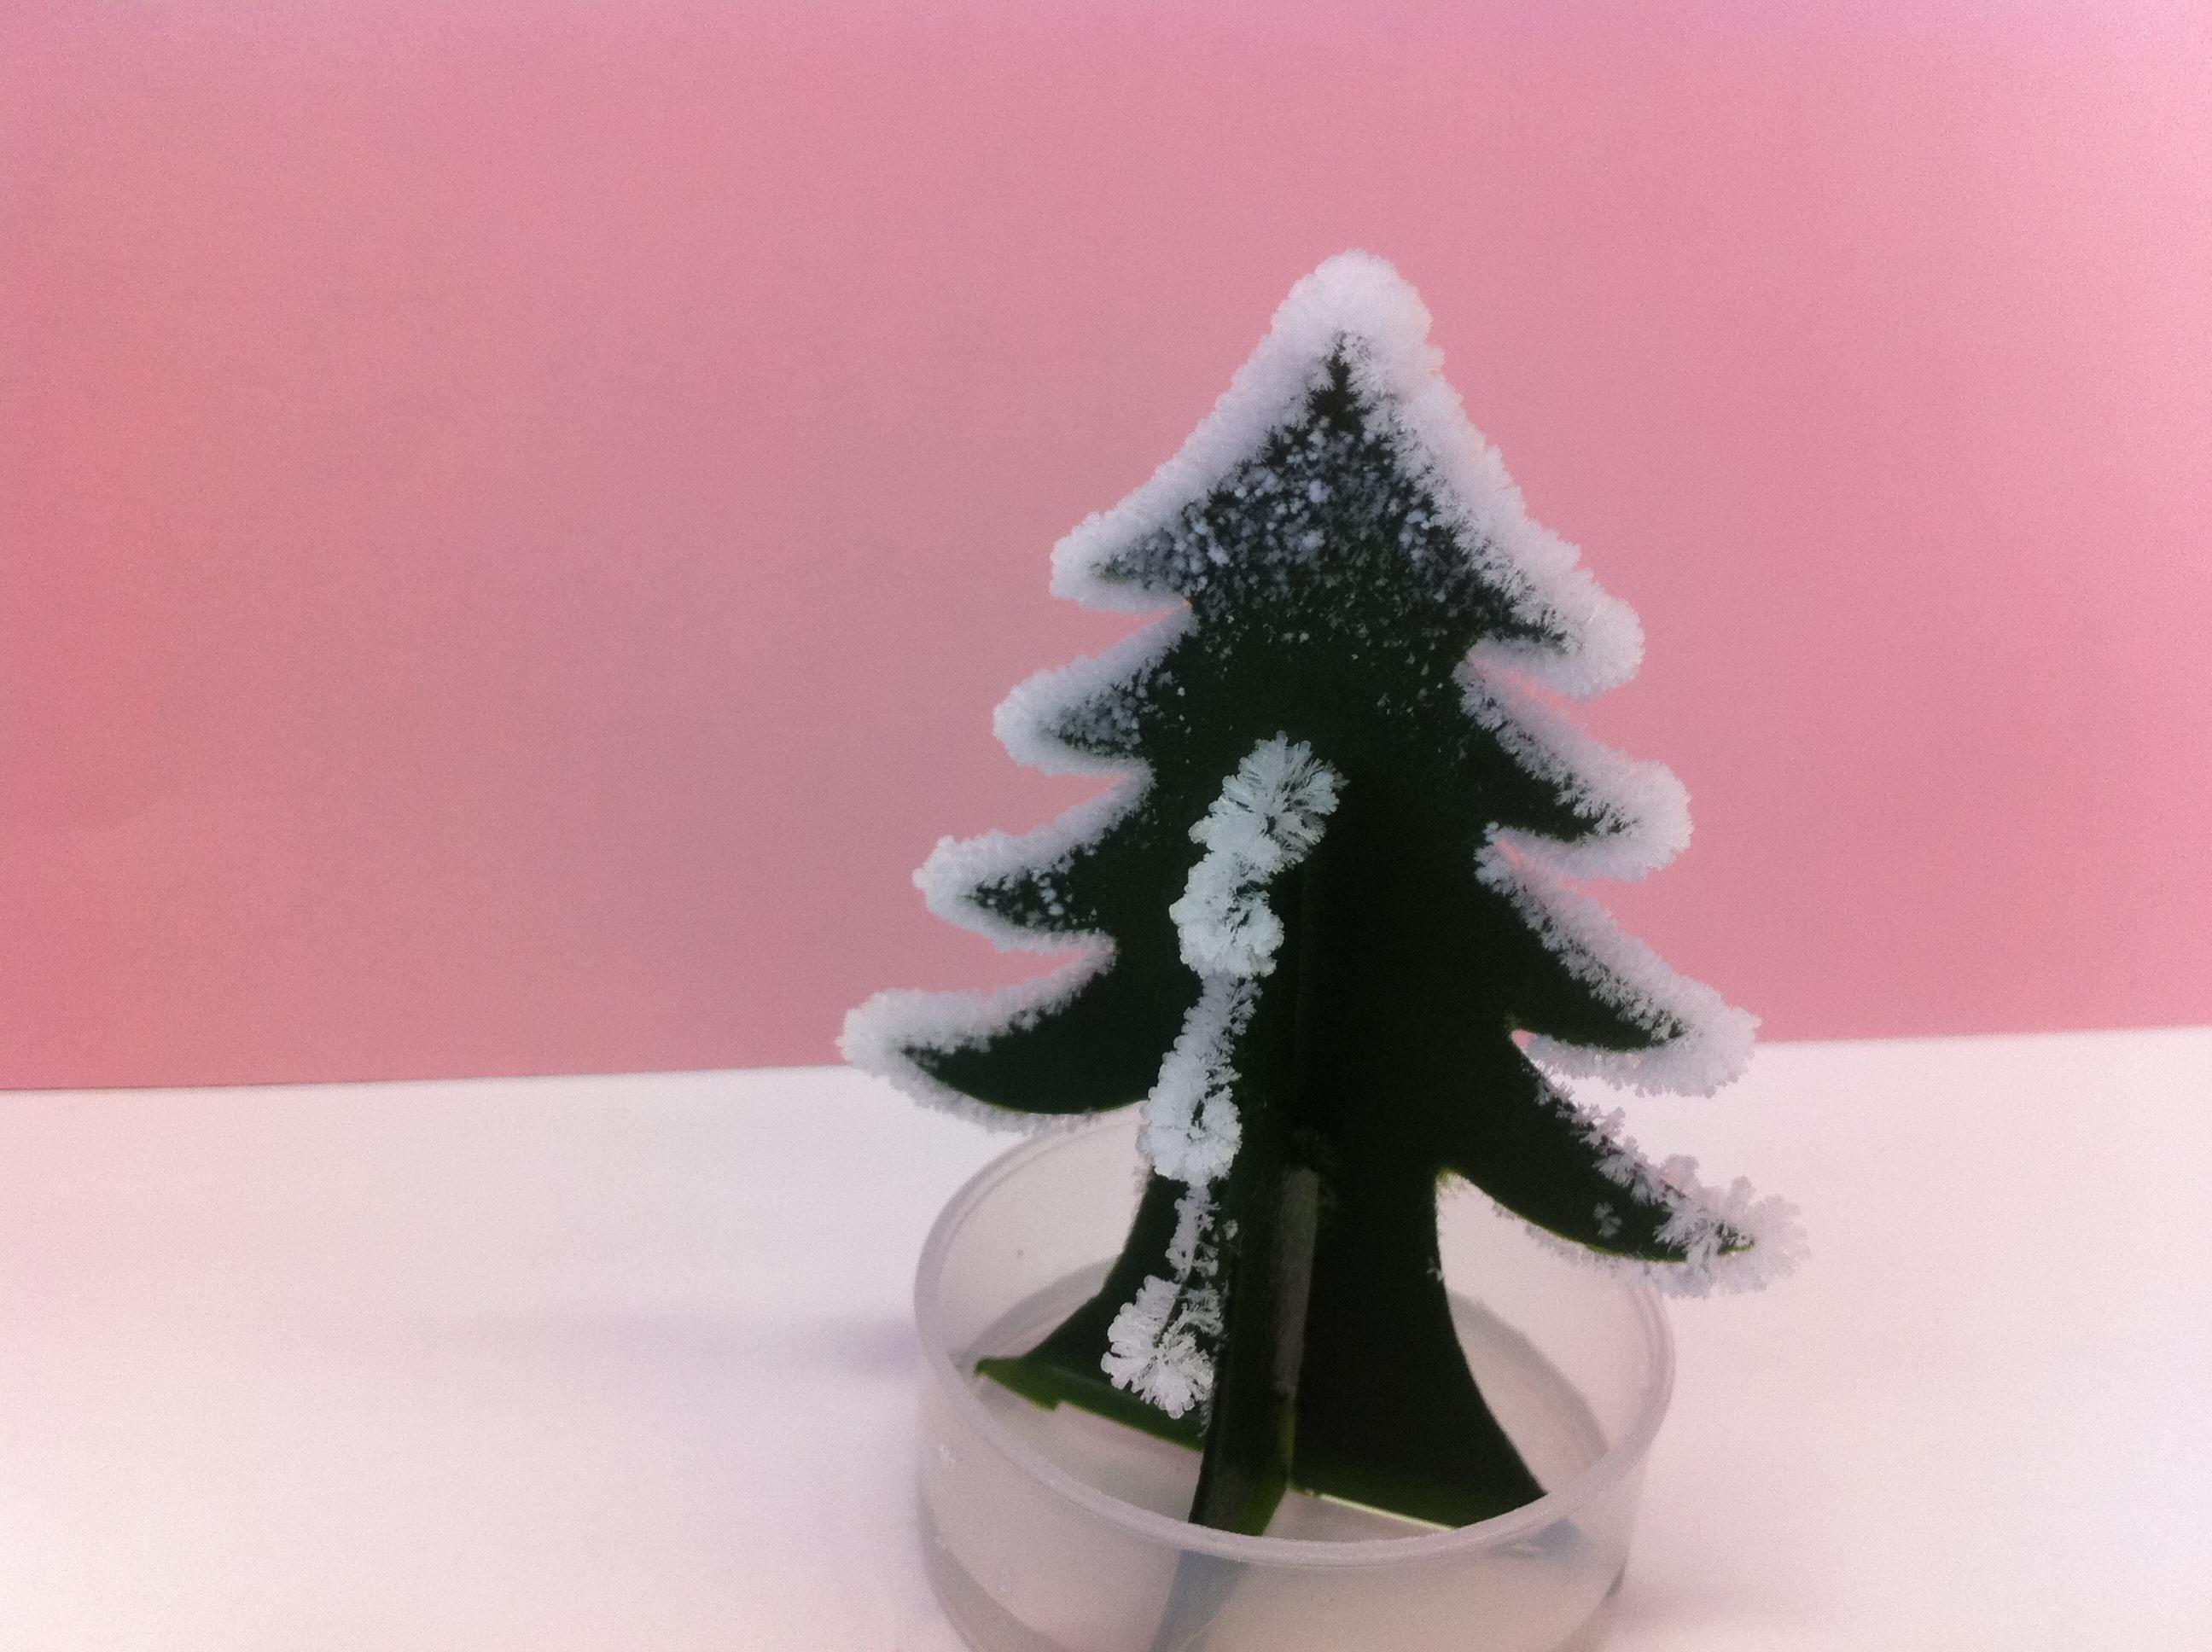 Chemistry World Blog » Crystal-growing Christmas Trees